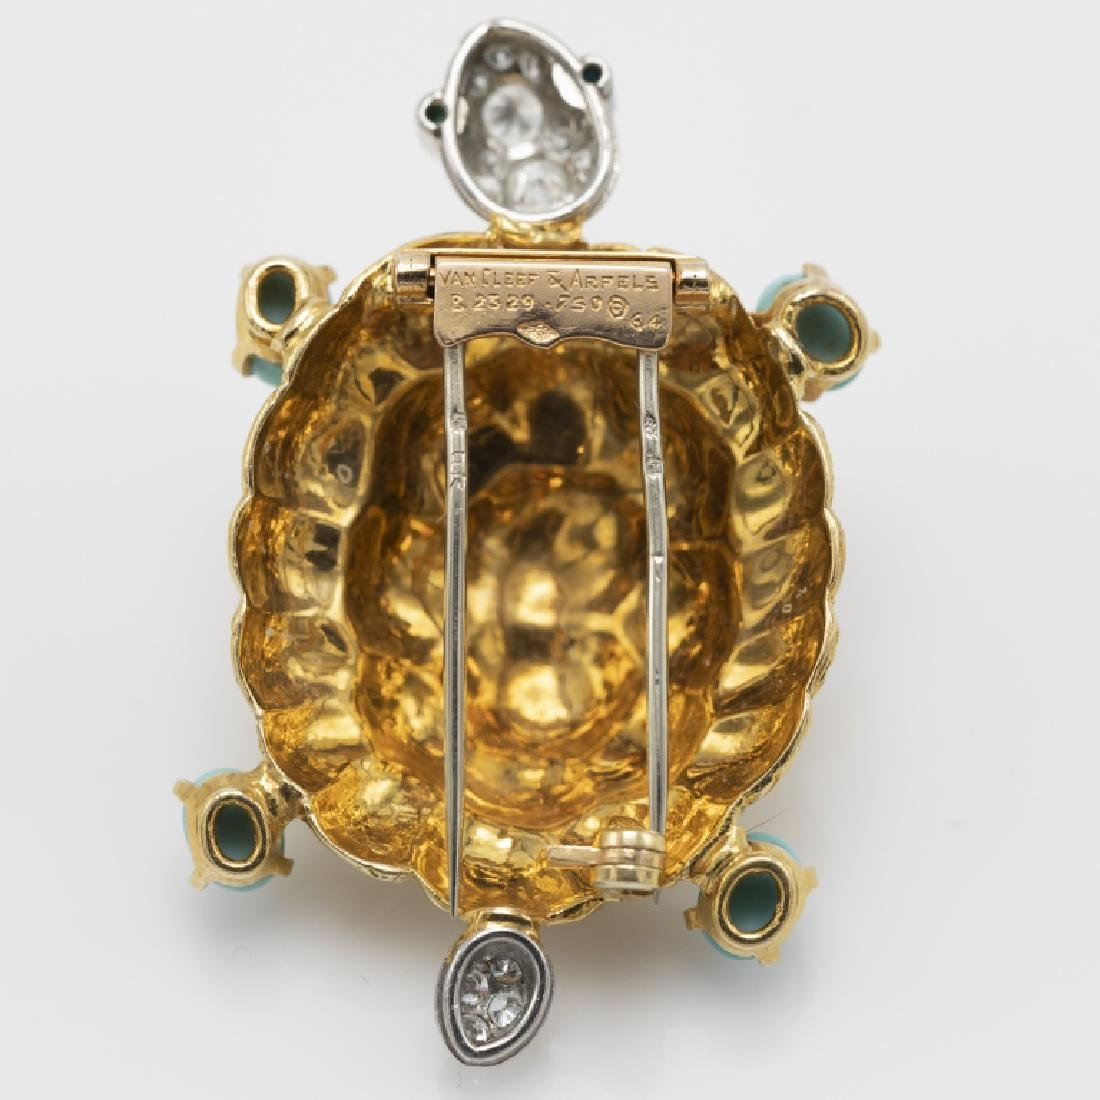 A Van Cleef & Arpels diamond, turquoise, 18k pin - 2